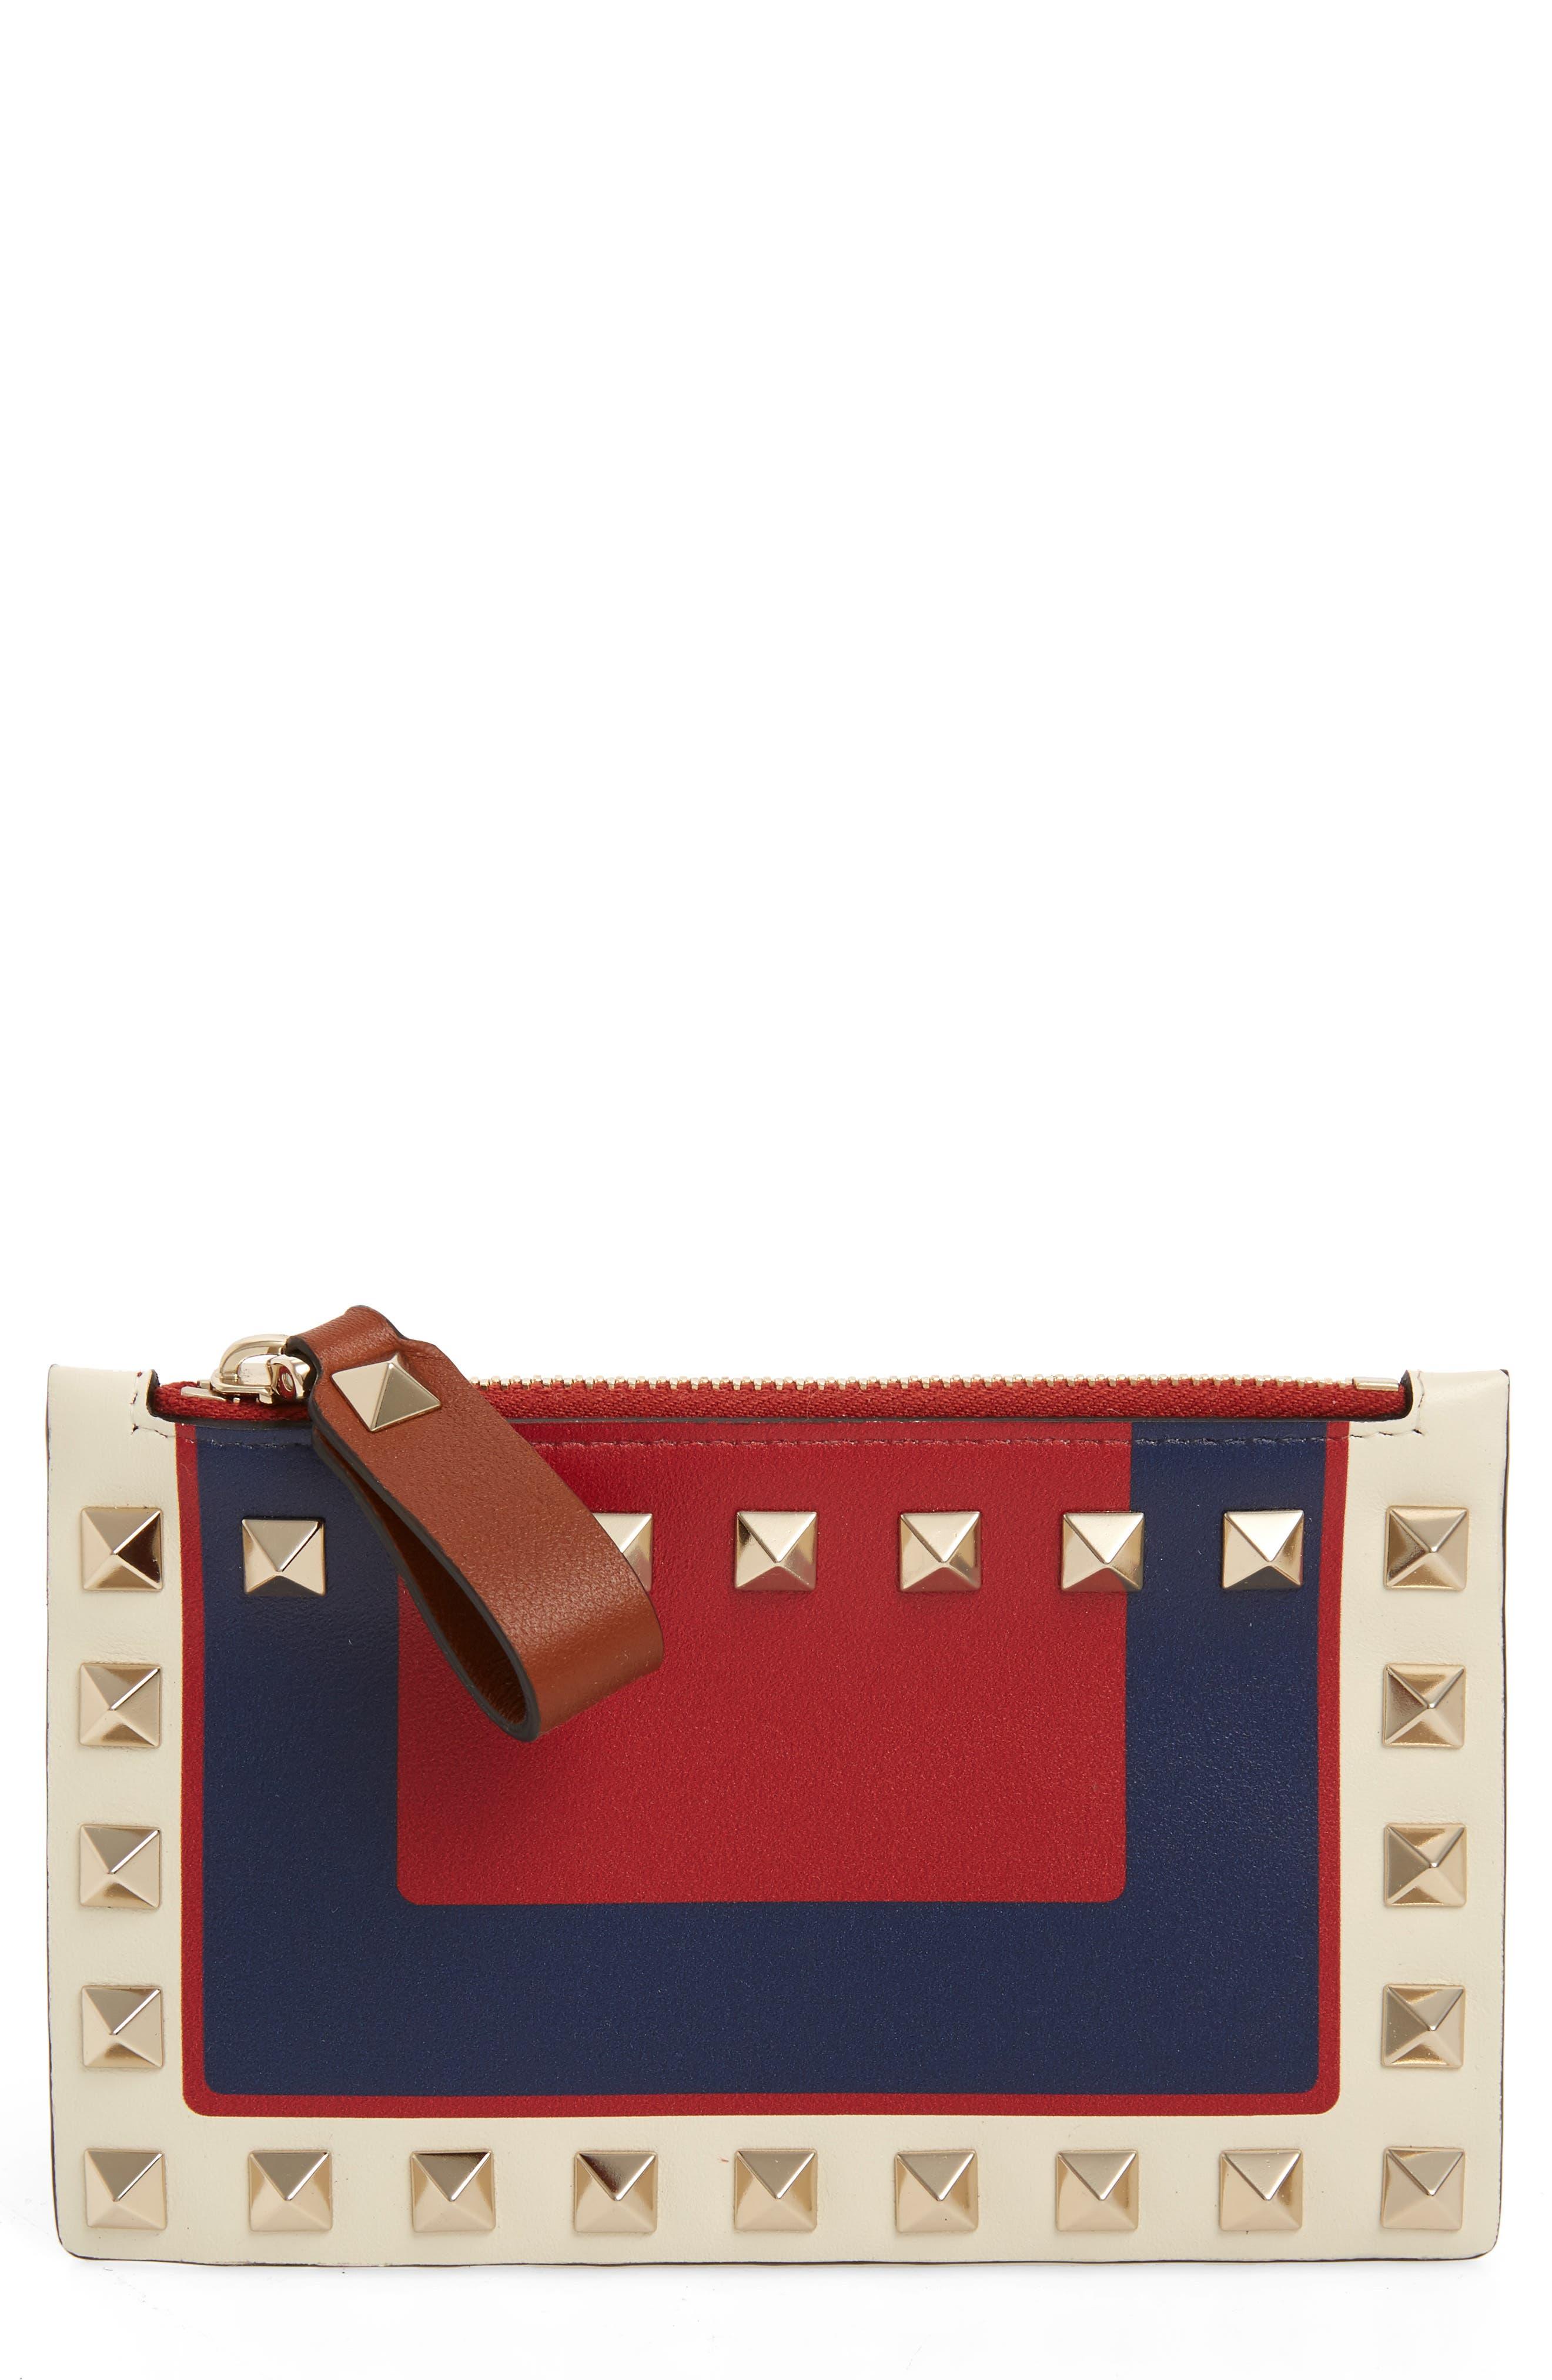 VALENTINO GARAVANI Rockstud Leather Zip Card Case, Main, color, ROSSO